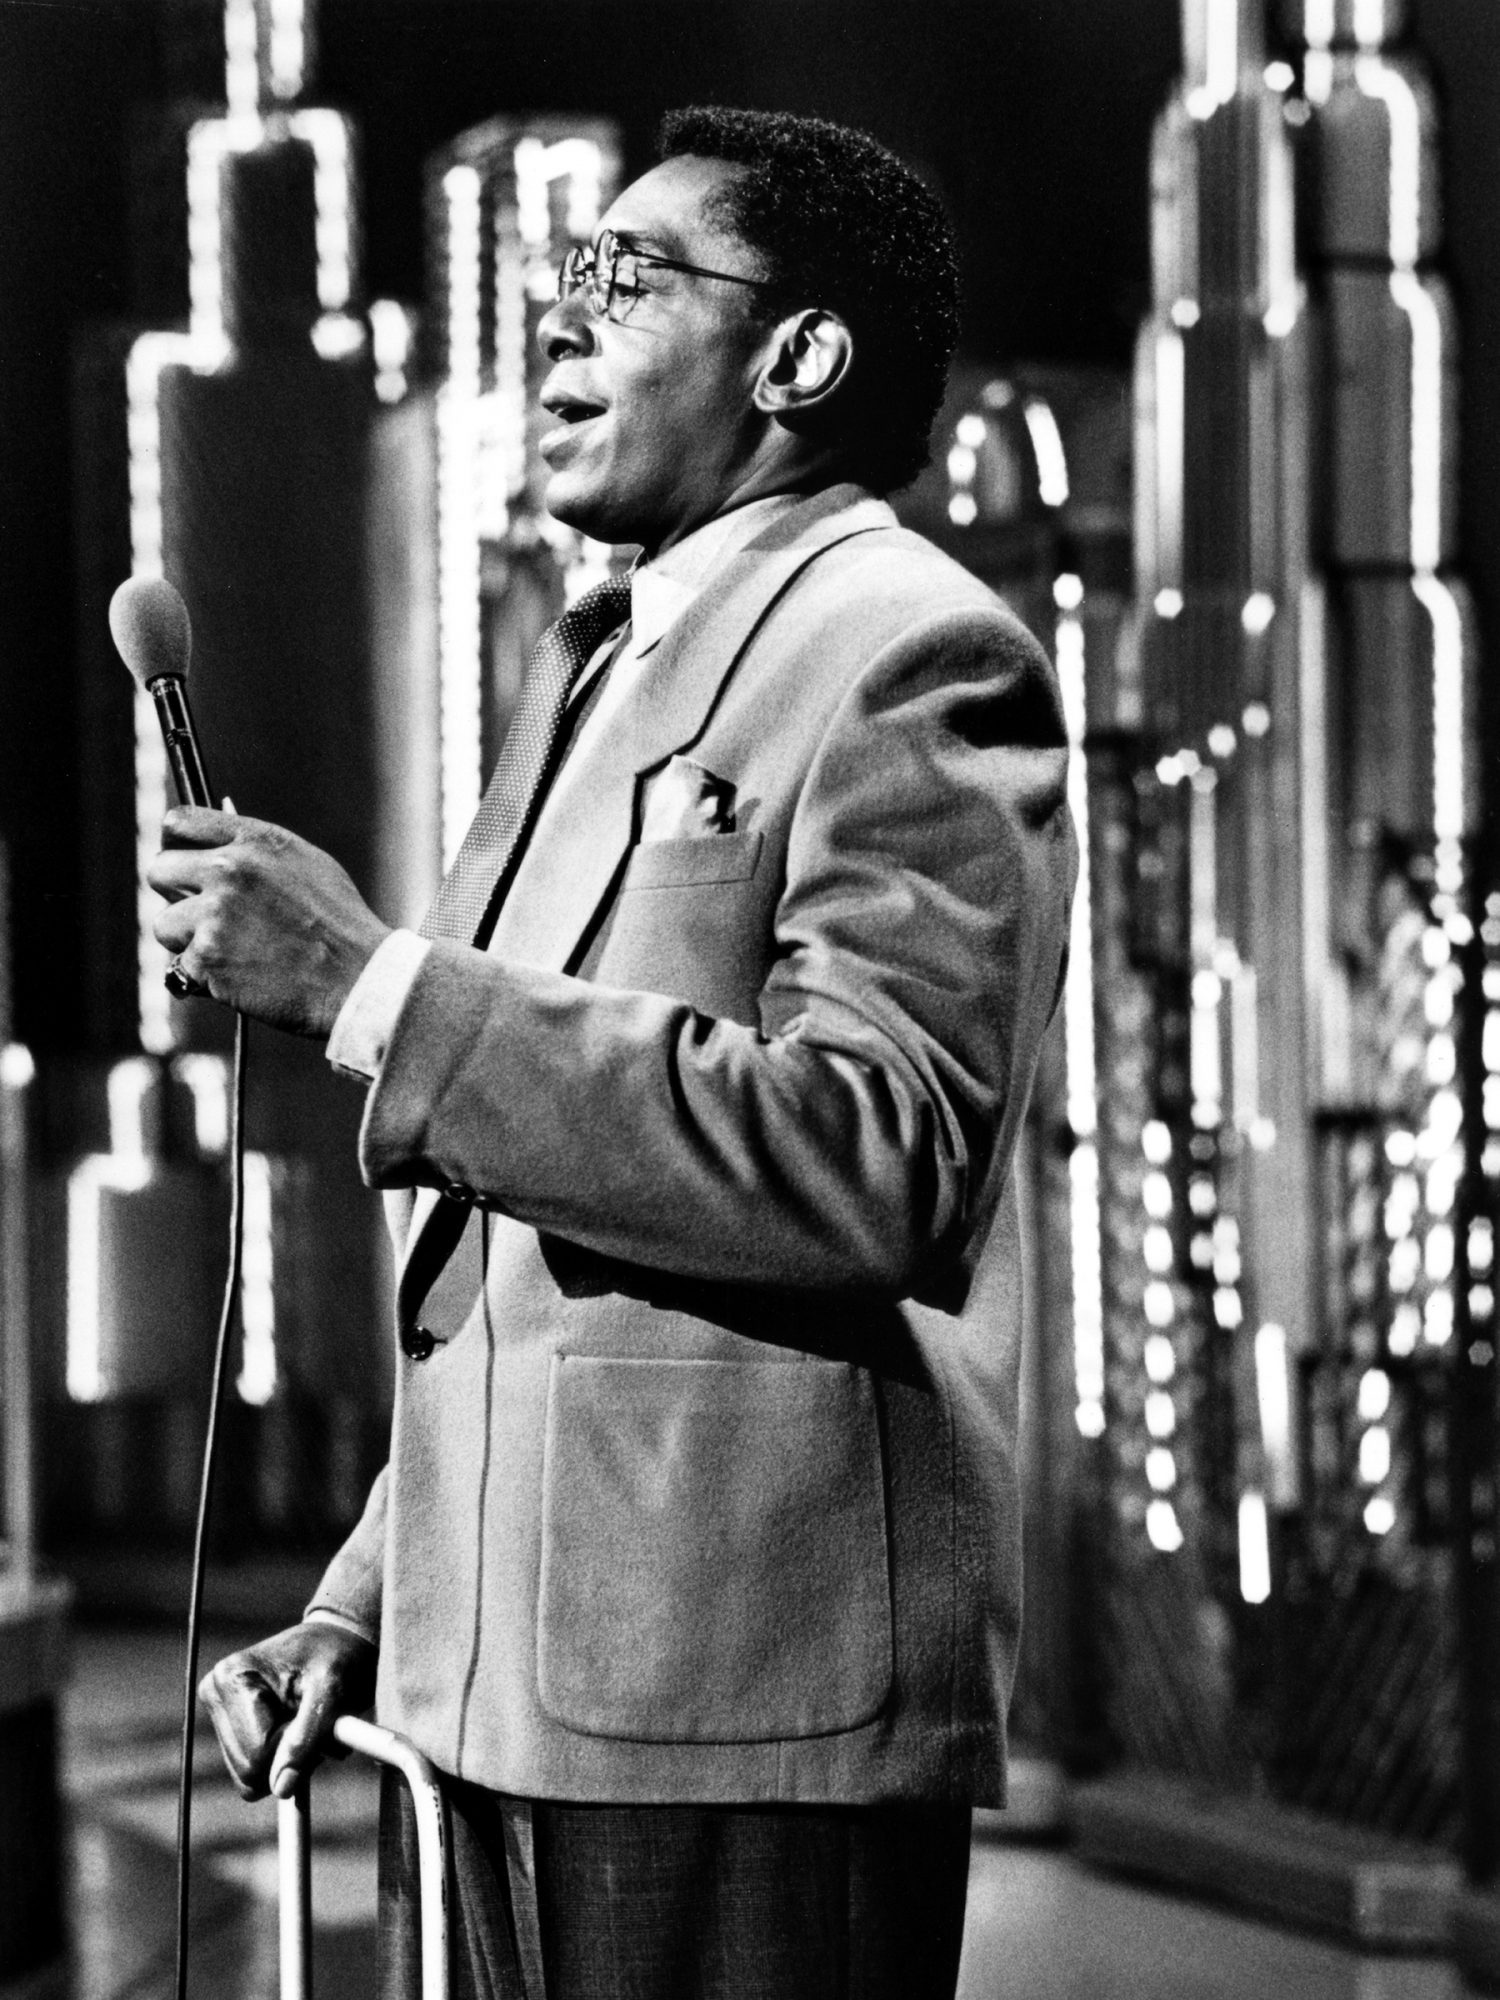 SOUL TRAIN, Host Don Cornelius, 1980s. 1971-present. (c) Tribune Entertainment/ Courtesy: Everett Co